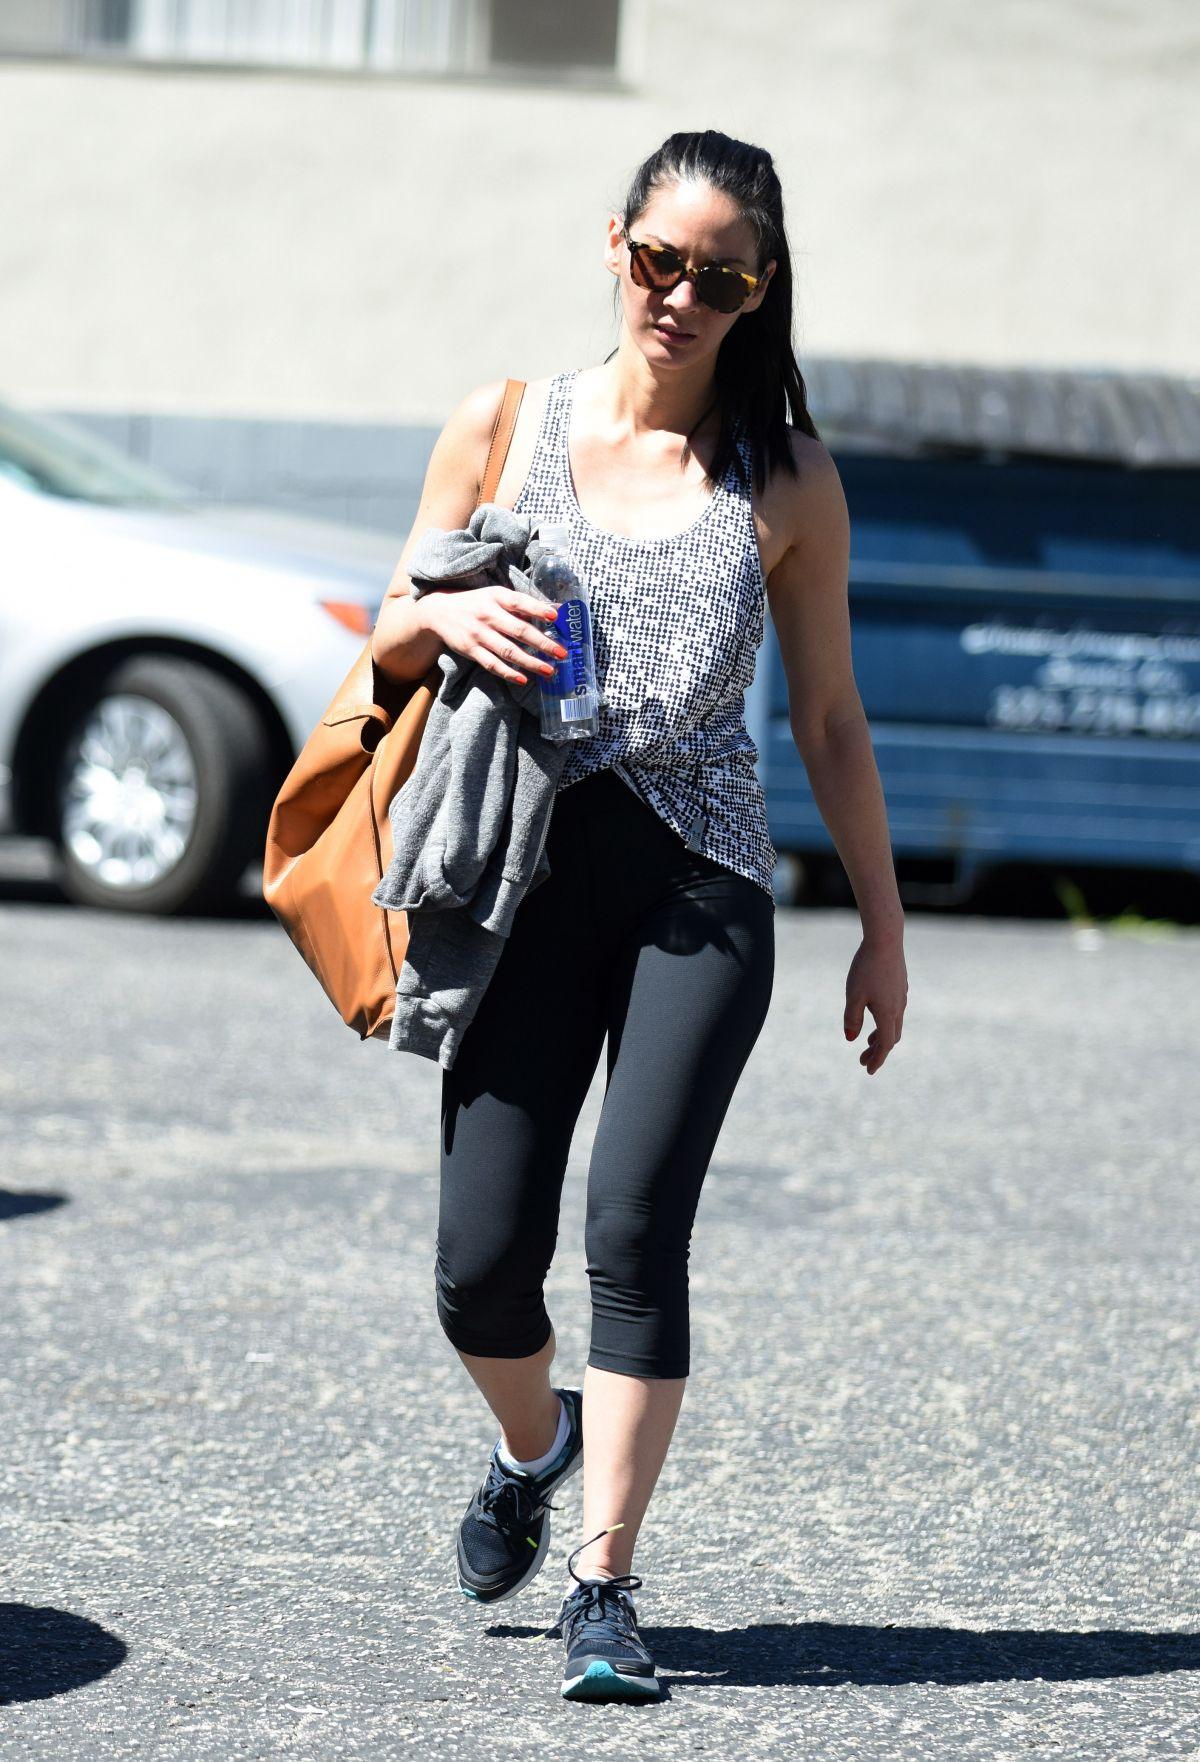 Kim Kardashian Leaving Bodyfactory Juice Bar In Los Angeles August 28th 2009